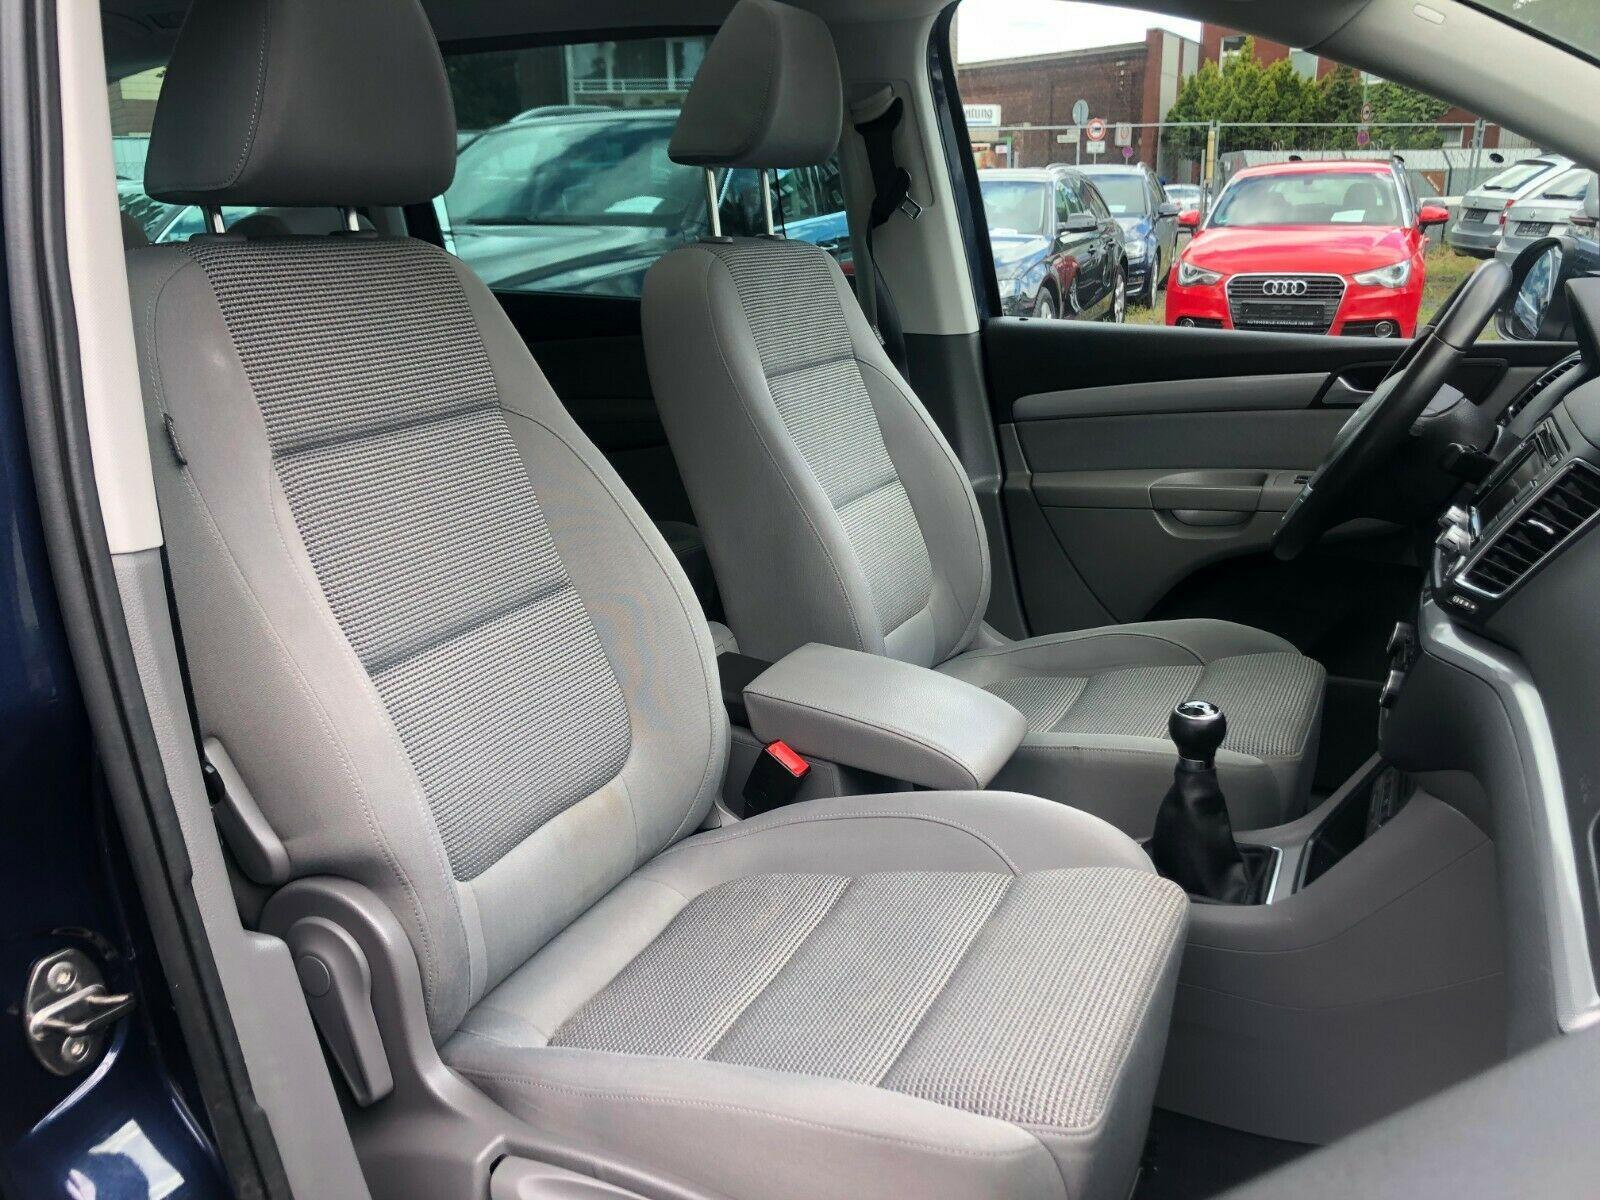 VW Sharan Comfort. 2.0 TDI 7-Sitzer Navi*Xenon*Pano